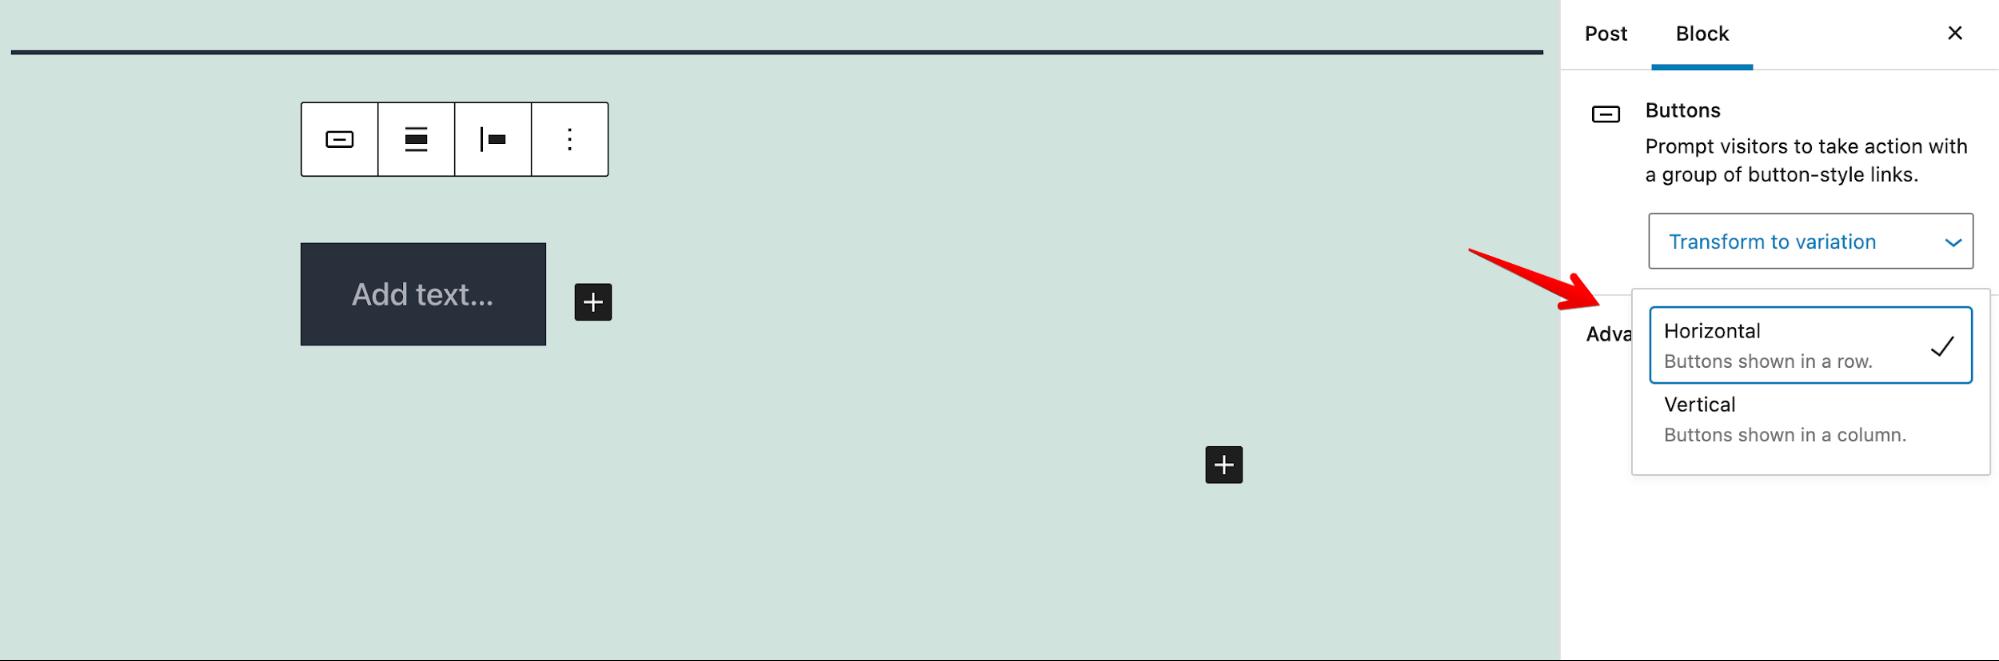 Buttons block alignement new feature WordPress 5.7